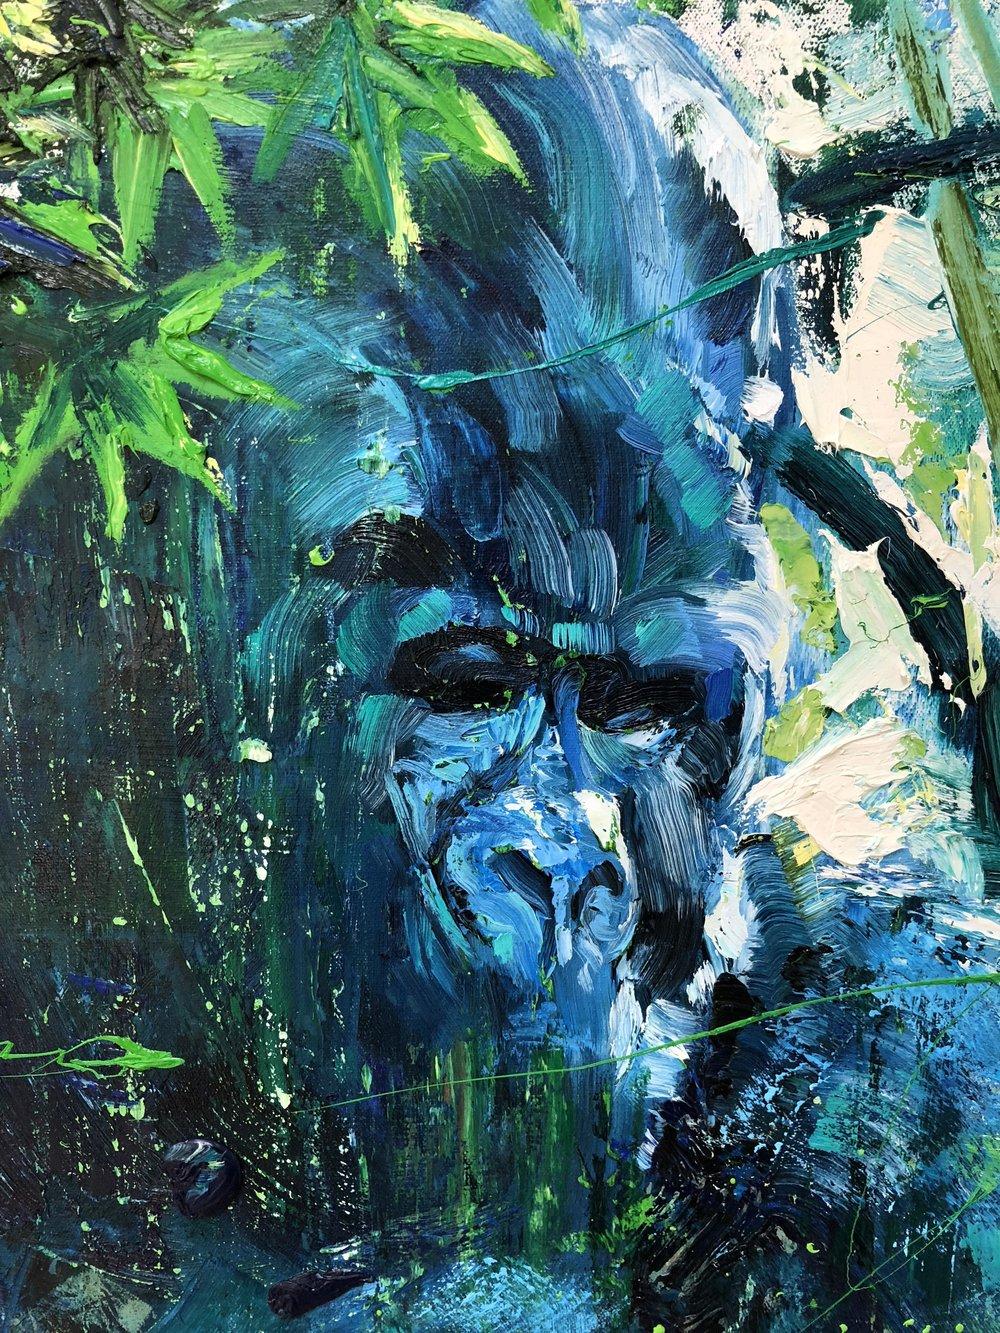 Chad-Robertson-Green-Gorilla-Detail-01